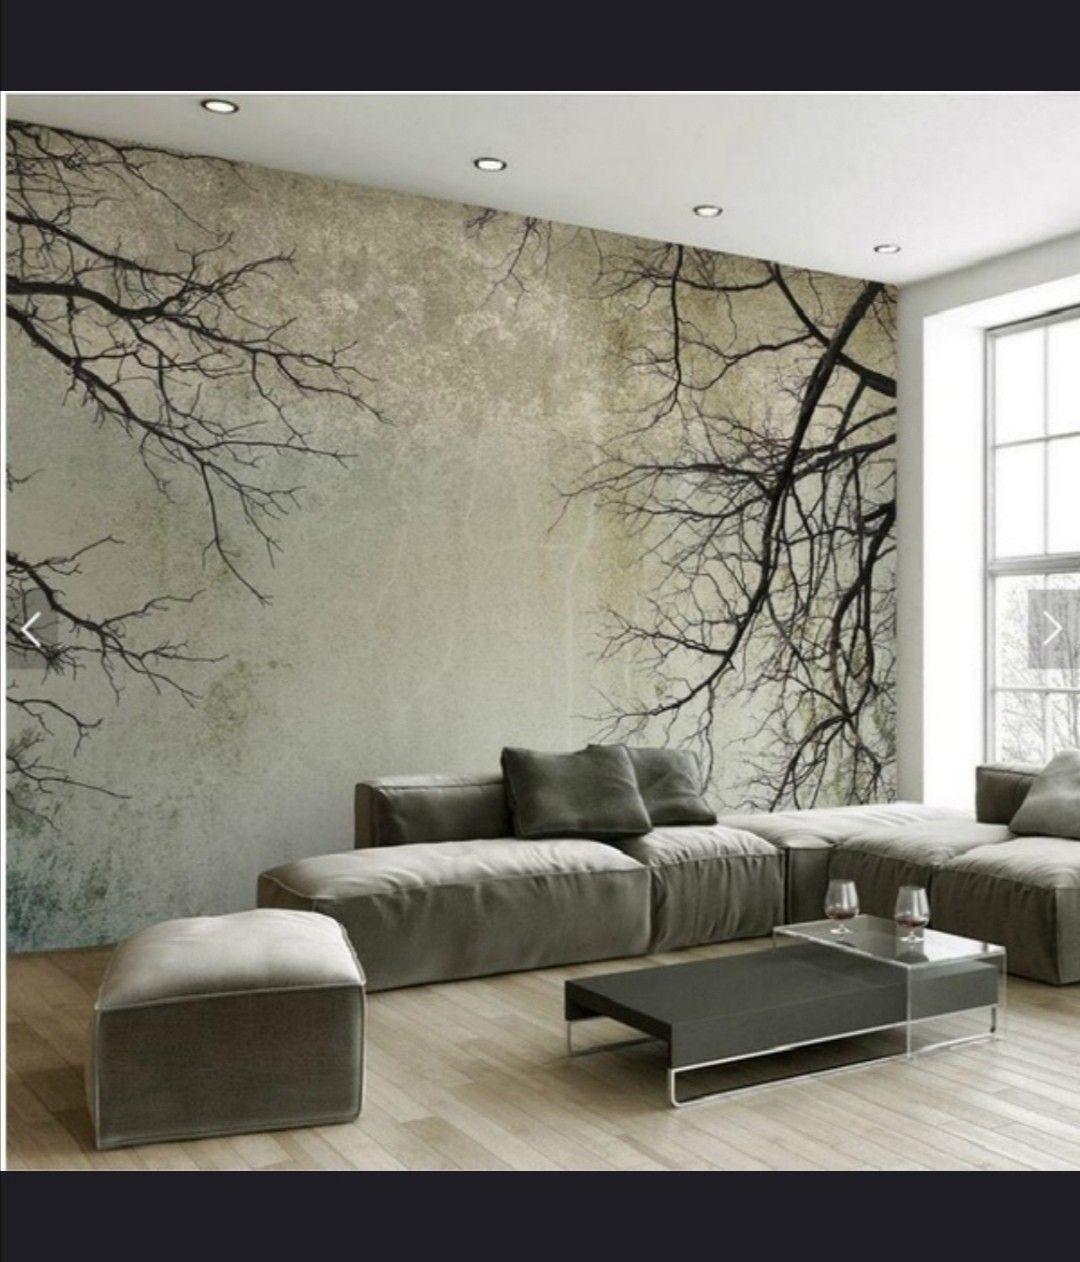 Custom vintage wallpaper, minimalist tree branches